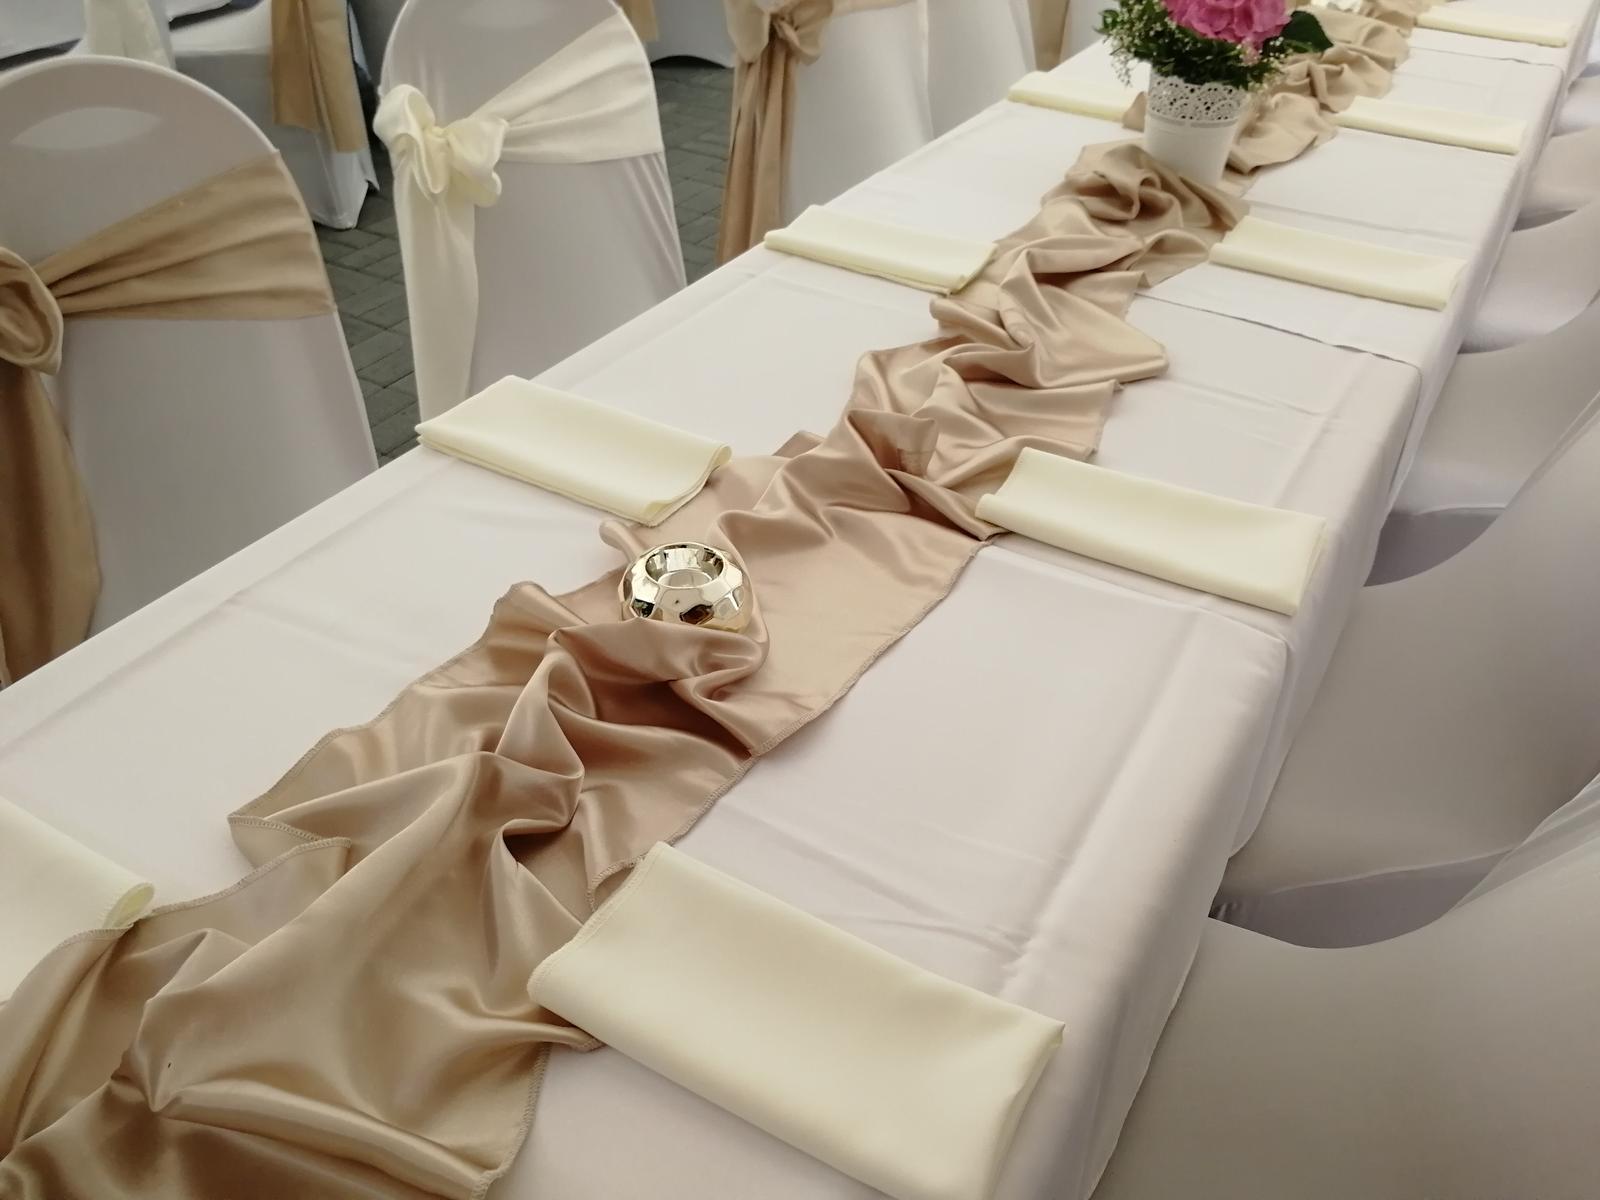 Svadba 8.9.2018 pod stanom :-) - Obrázok č. 6